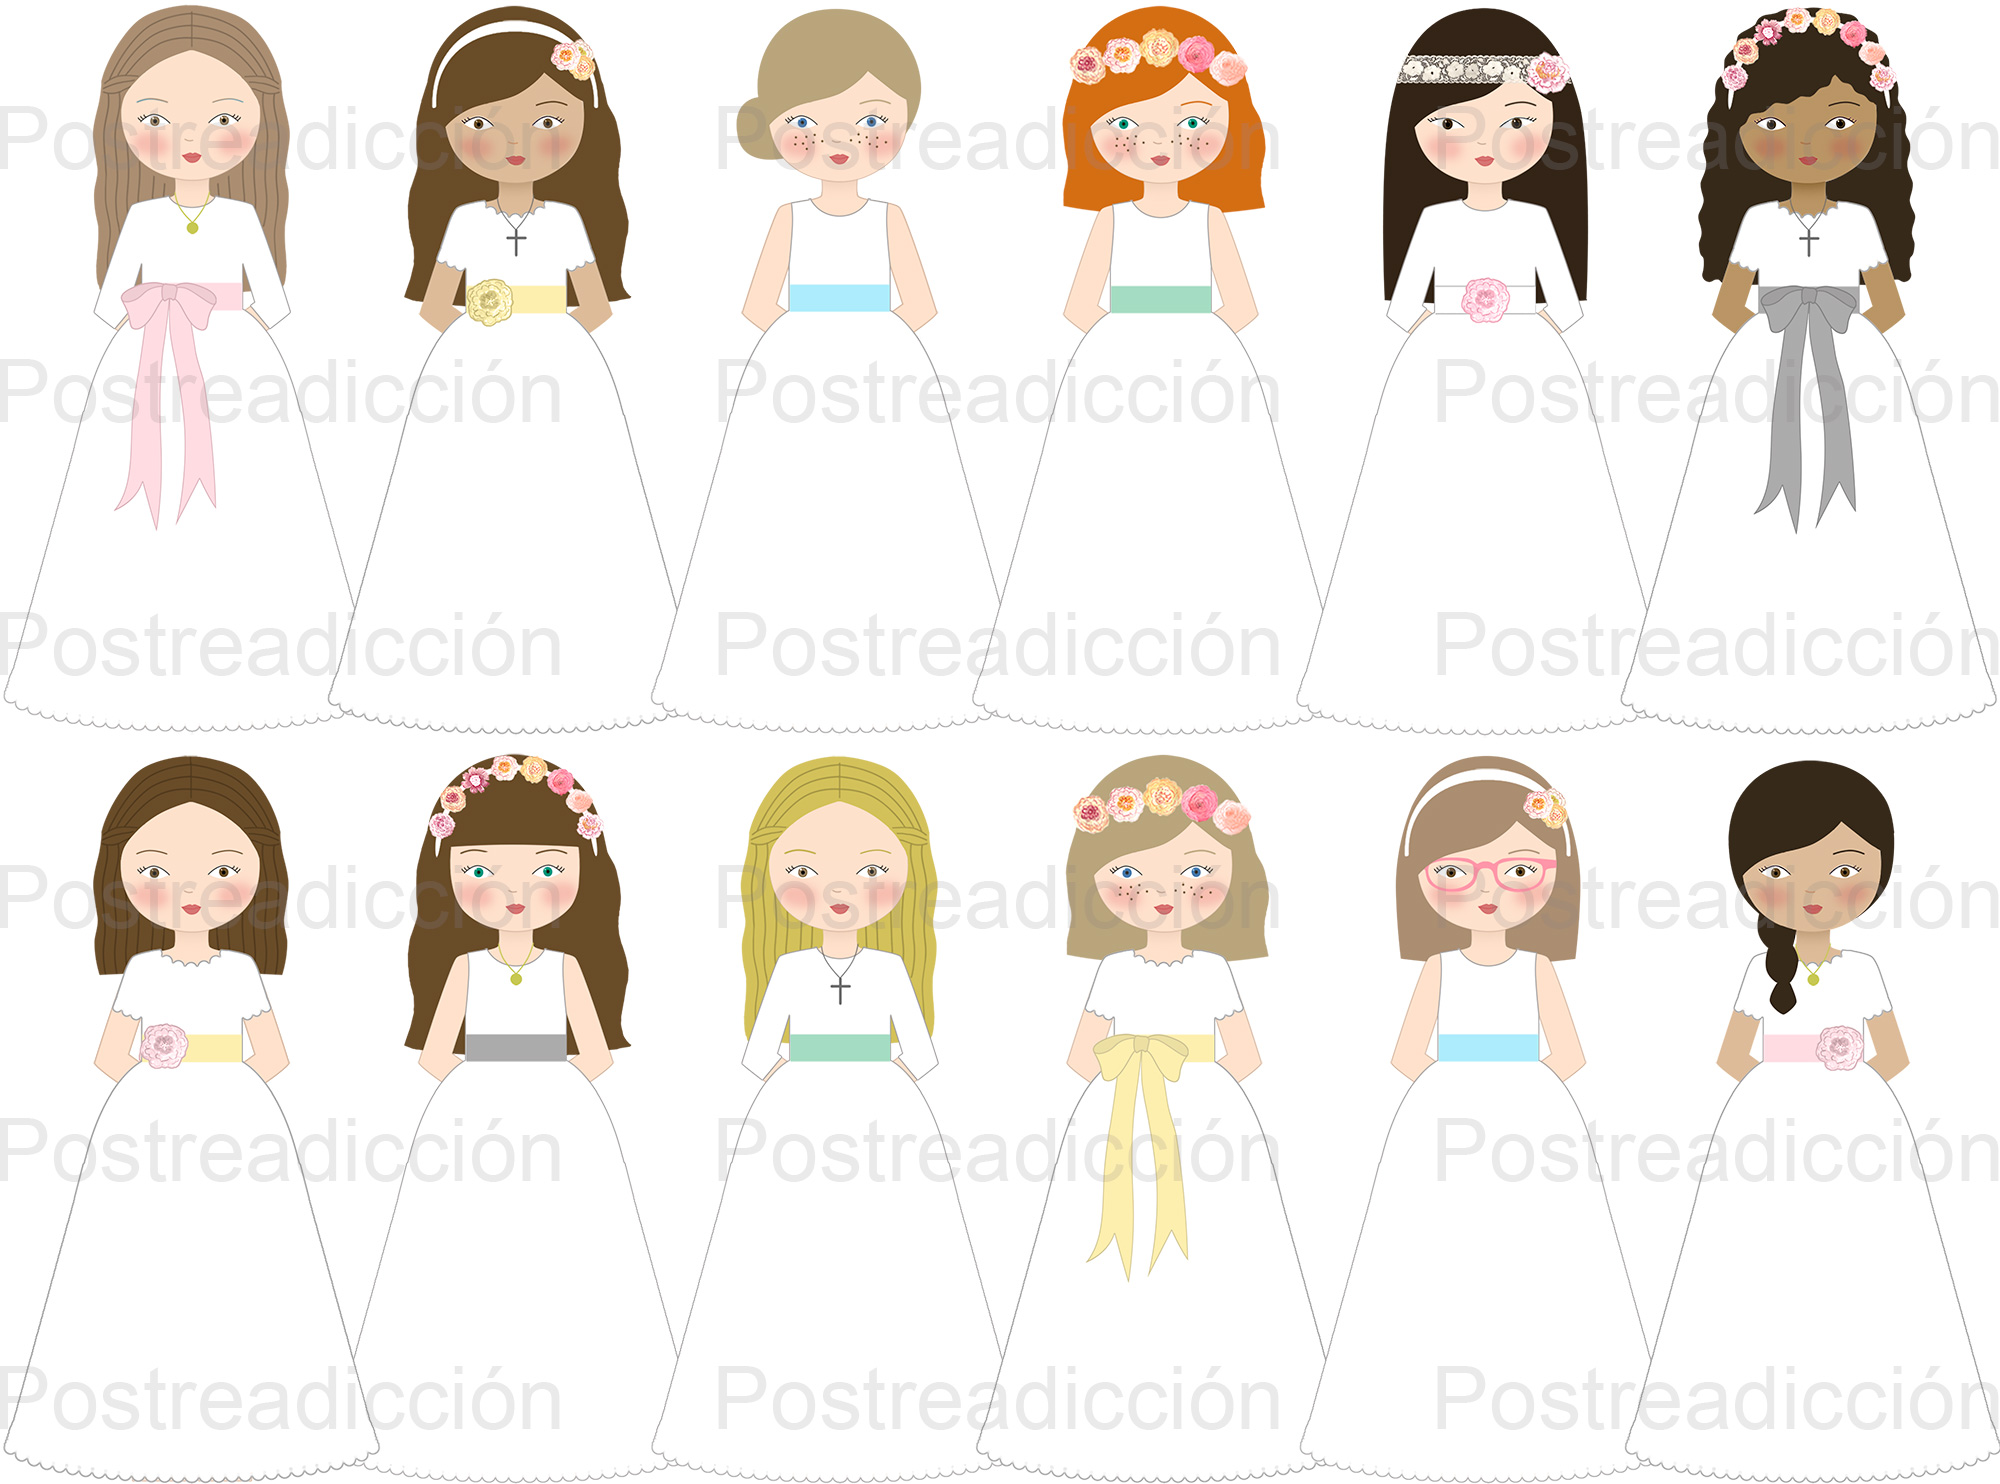 Imagen de producto: https://tienda.postreadiccion.com/img/articulos/secundarias13226-10-bolsas-para-rellenar-de-nina-de-comunion-carlota-sencillo-4.jpg